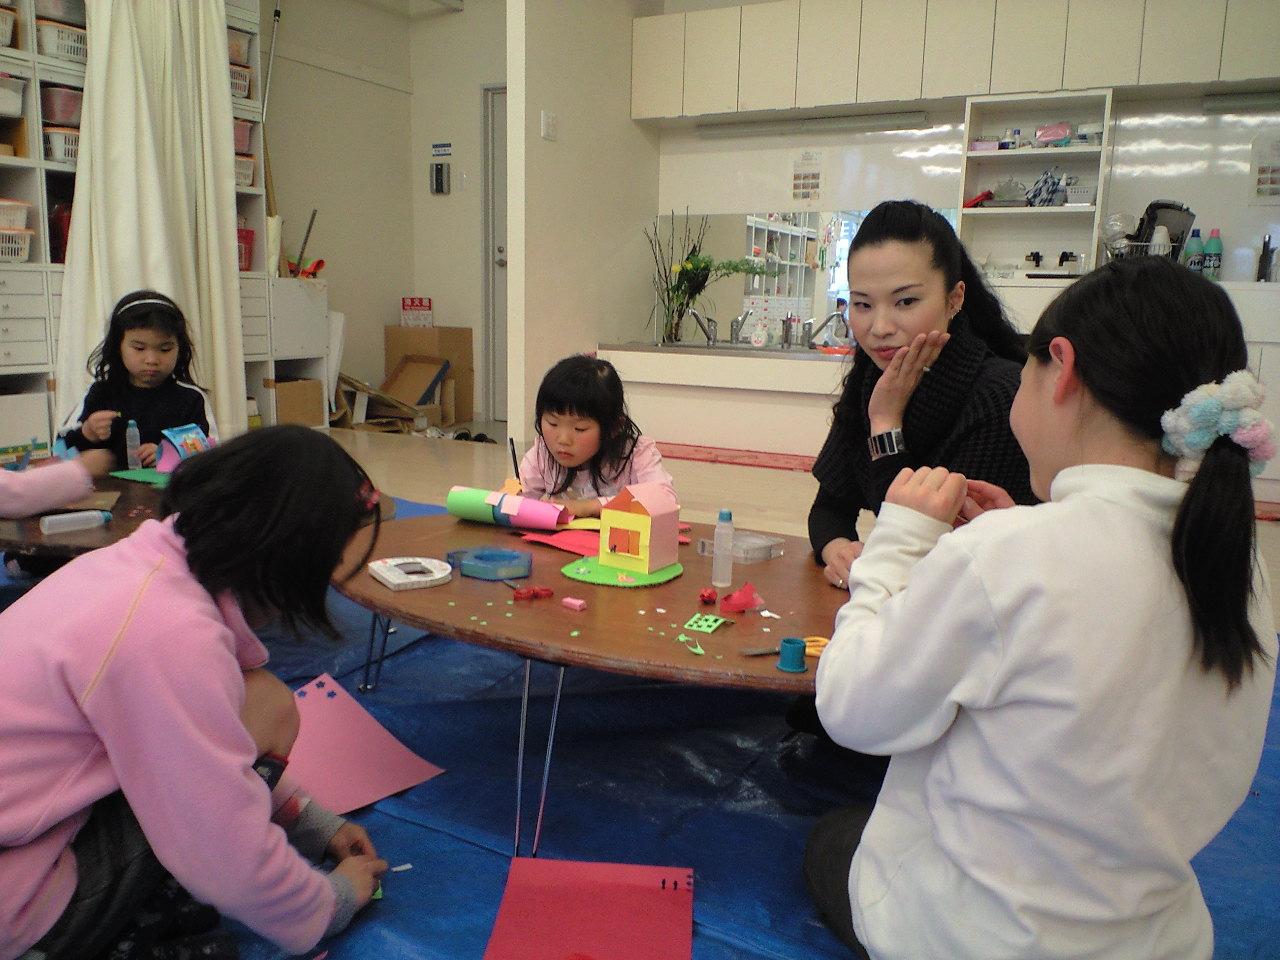 Boxハウス 水彩~松井山手教室~_f0215199_2238111.jpg